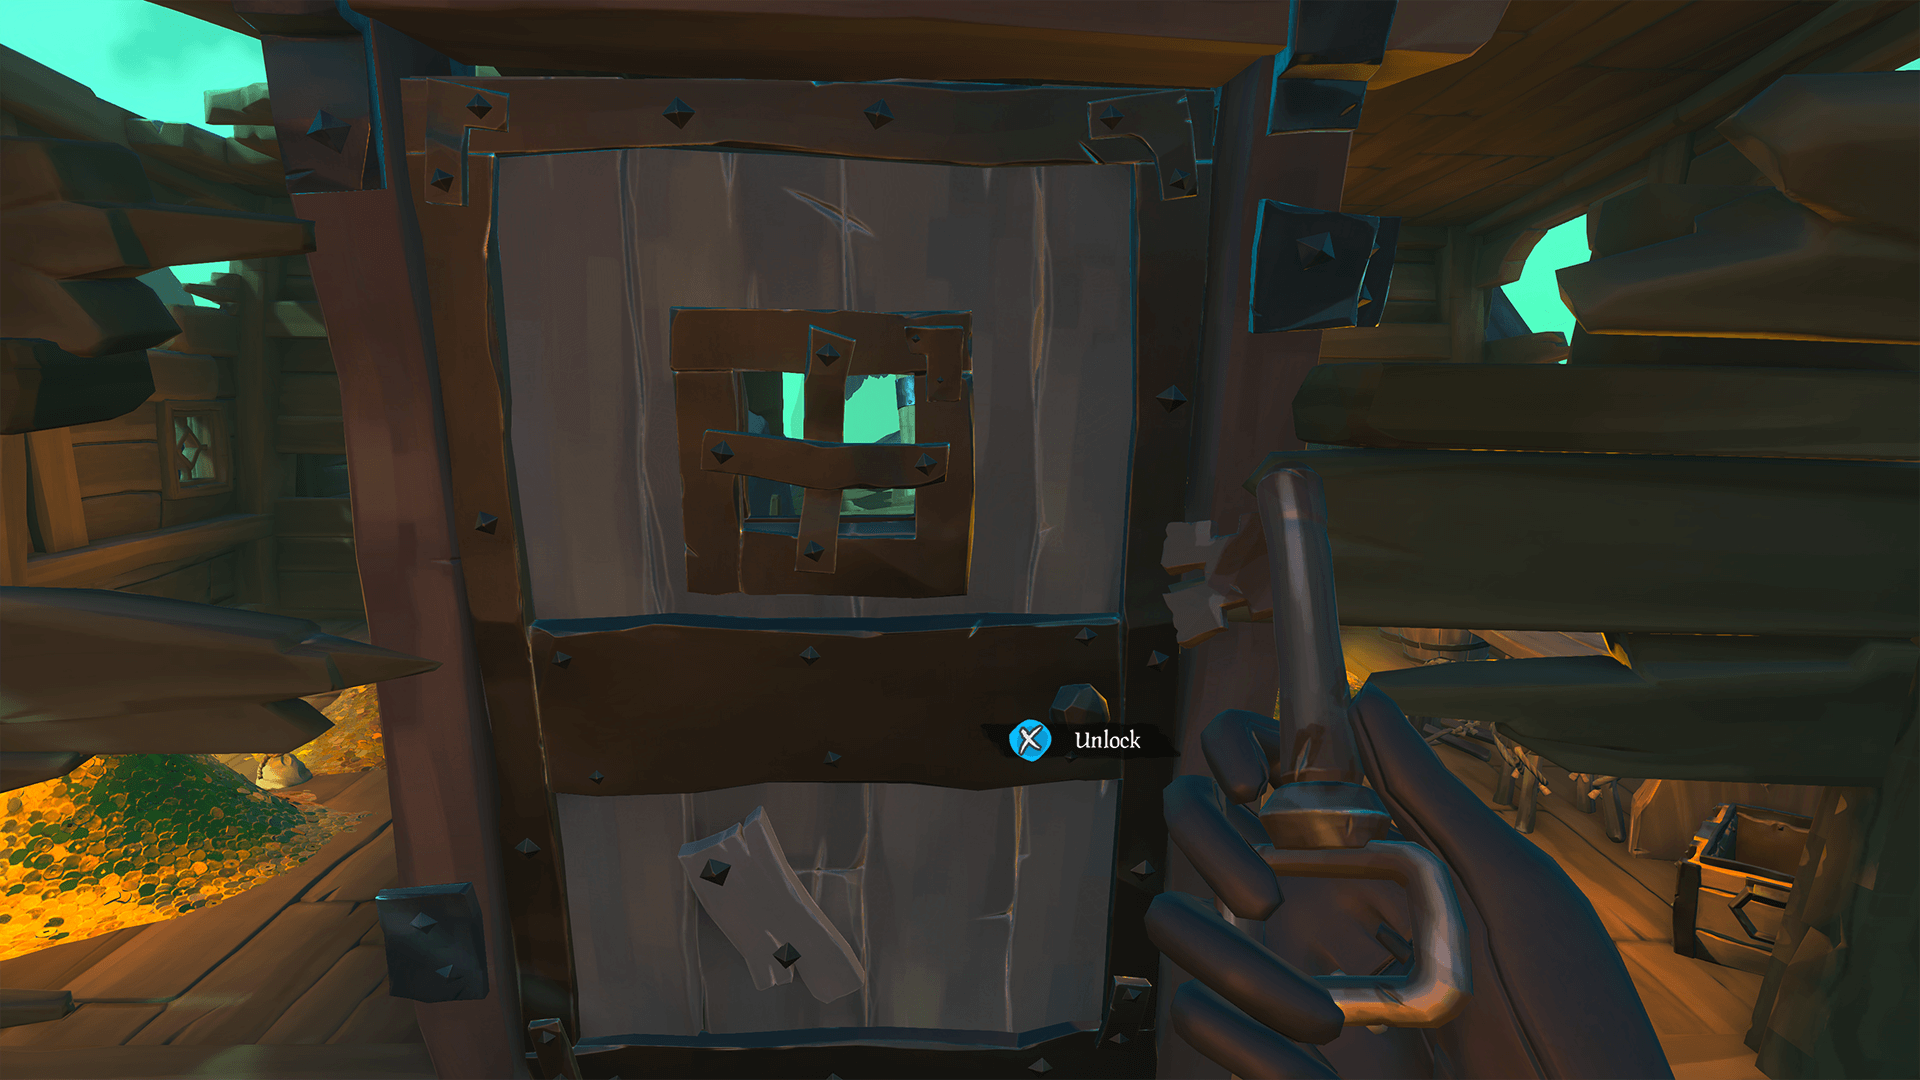 Unlock Ship of Thieves